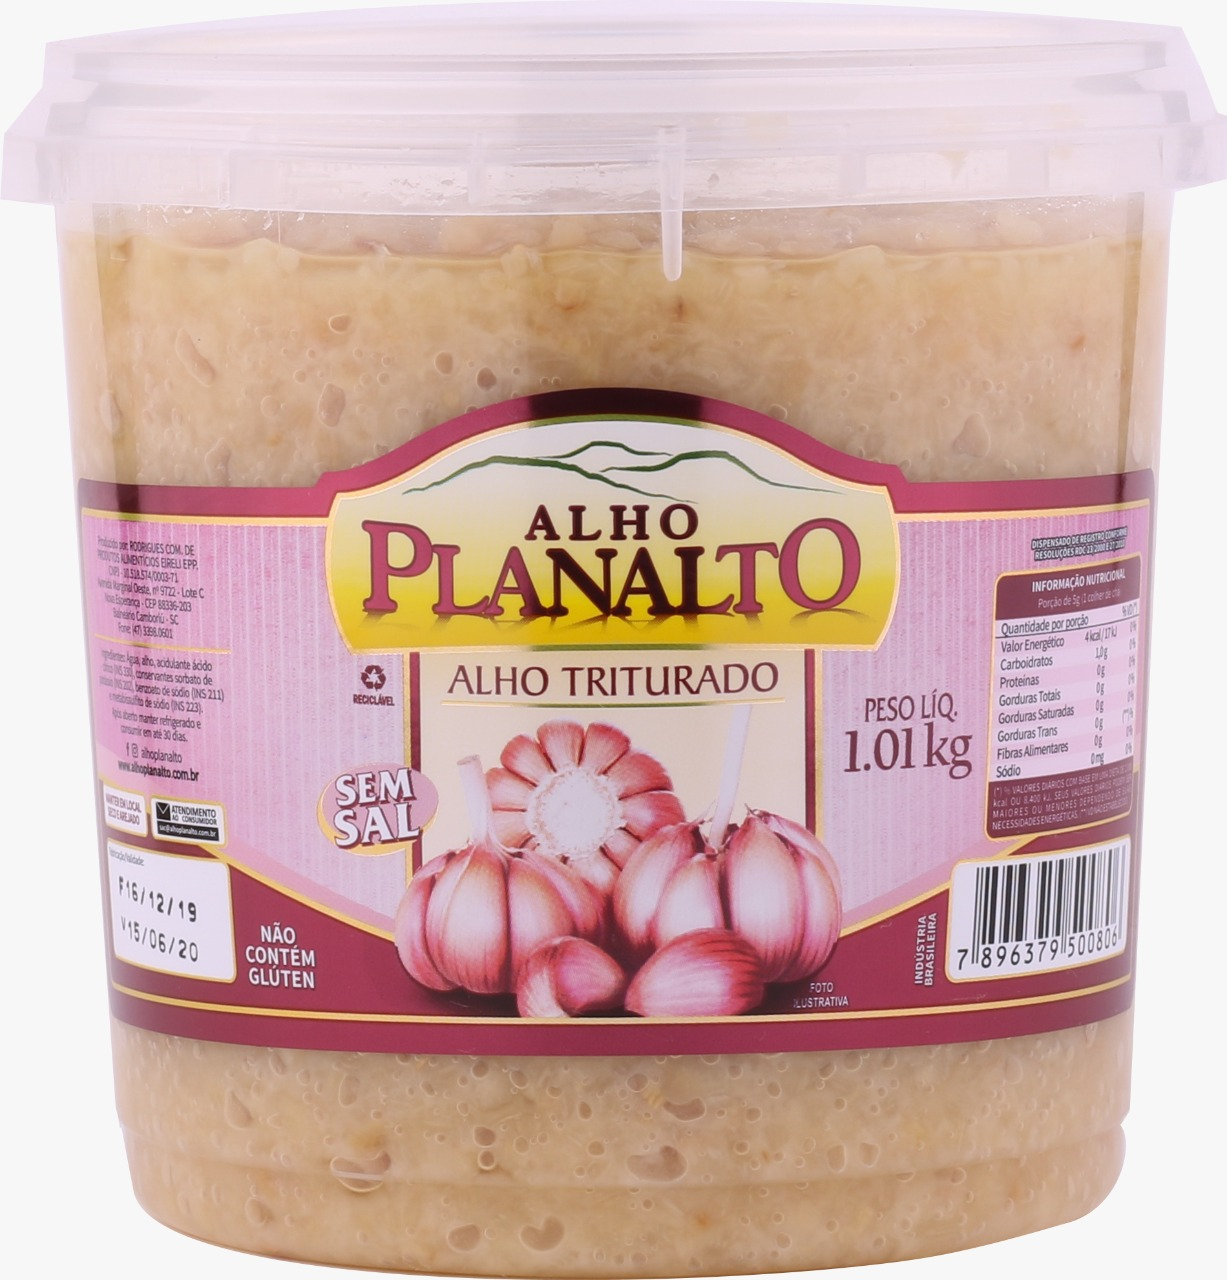 ALHO TRITURADO SEM SAL PLANALTO 1,01KG